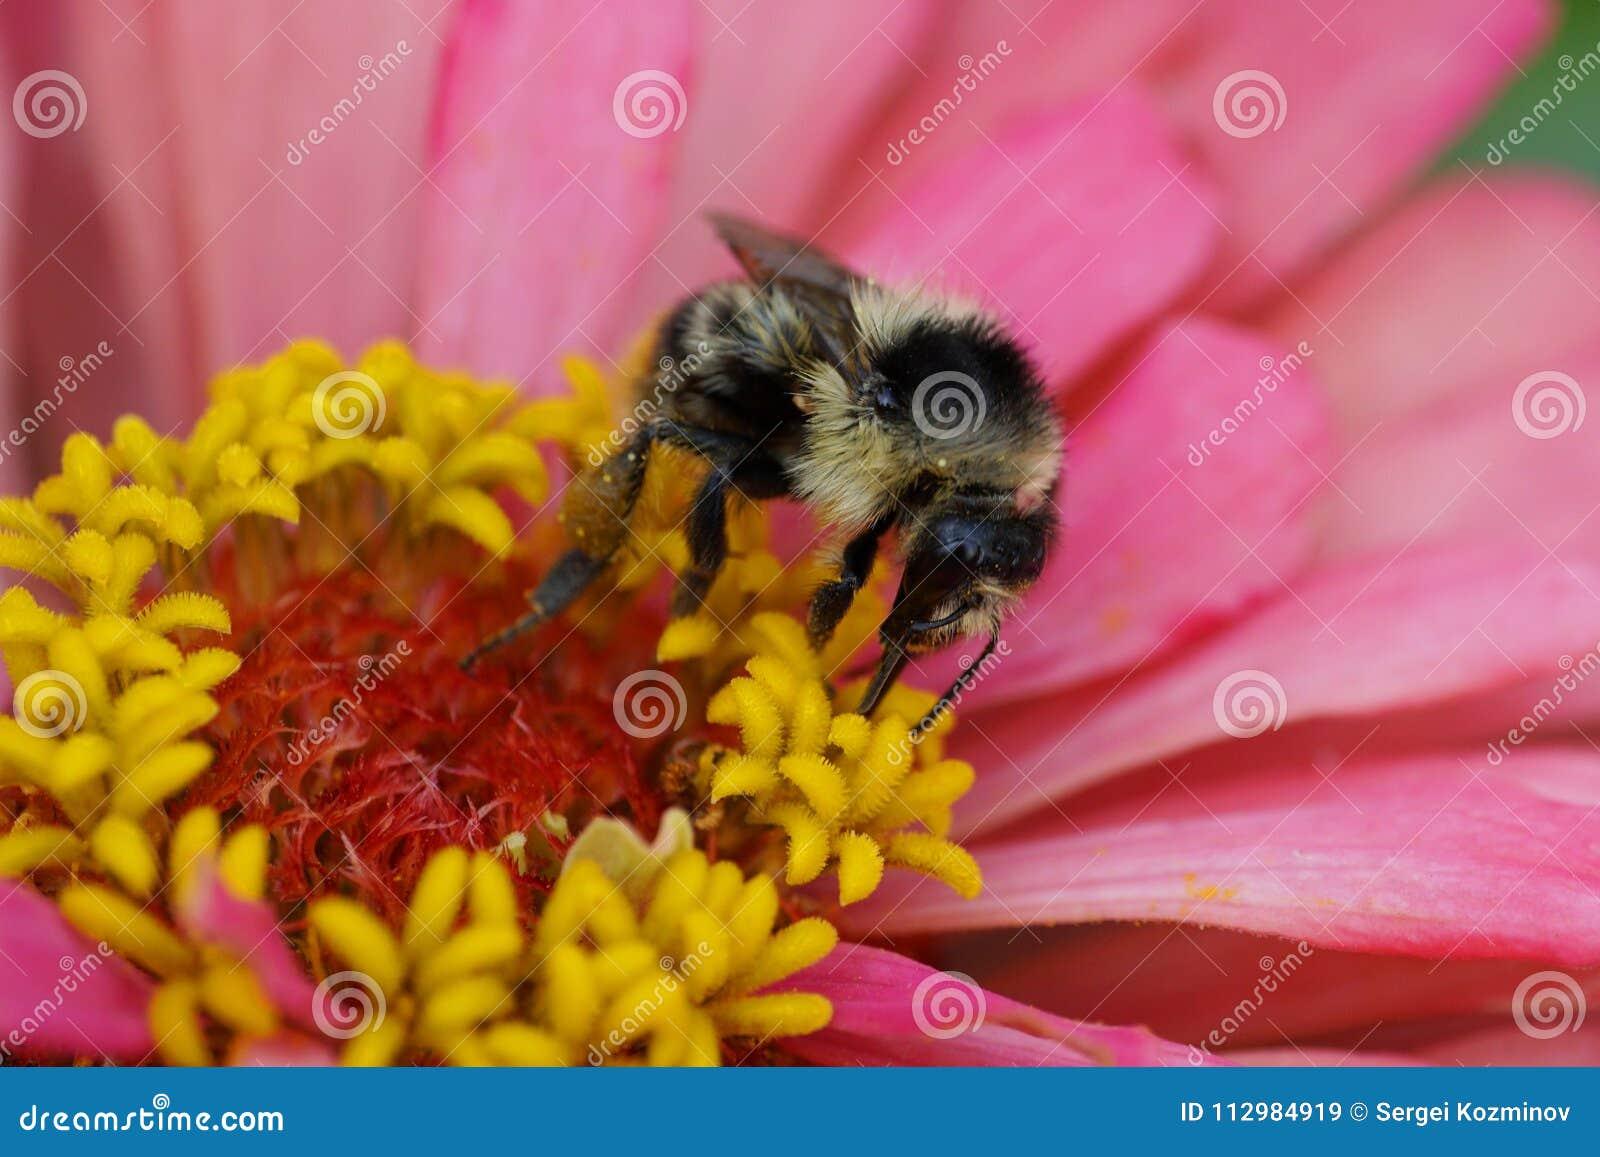 Macro view of Caucasian fluffy striped bumblebee Bombus serrisquama on yellow-pink Zinnia